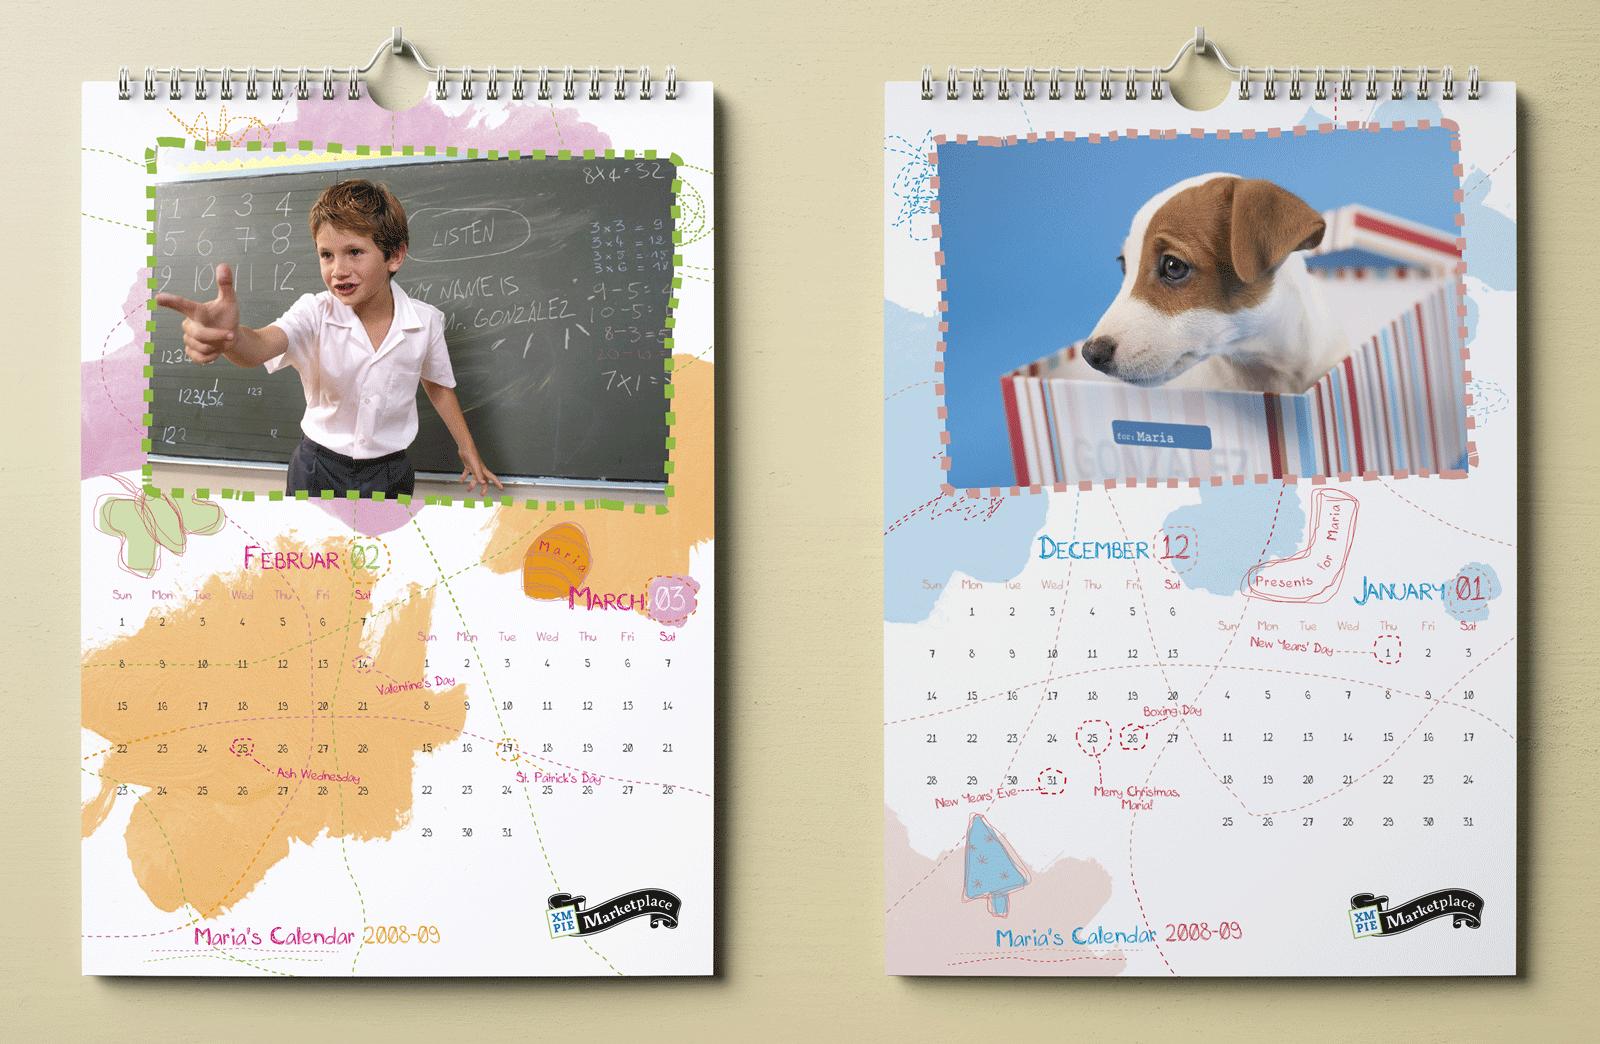 https://bigeyes.co.il/wp-content/uploads/2019/07/kids-calendar-3.png